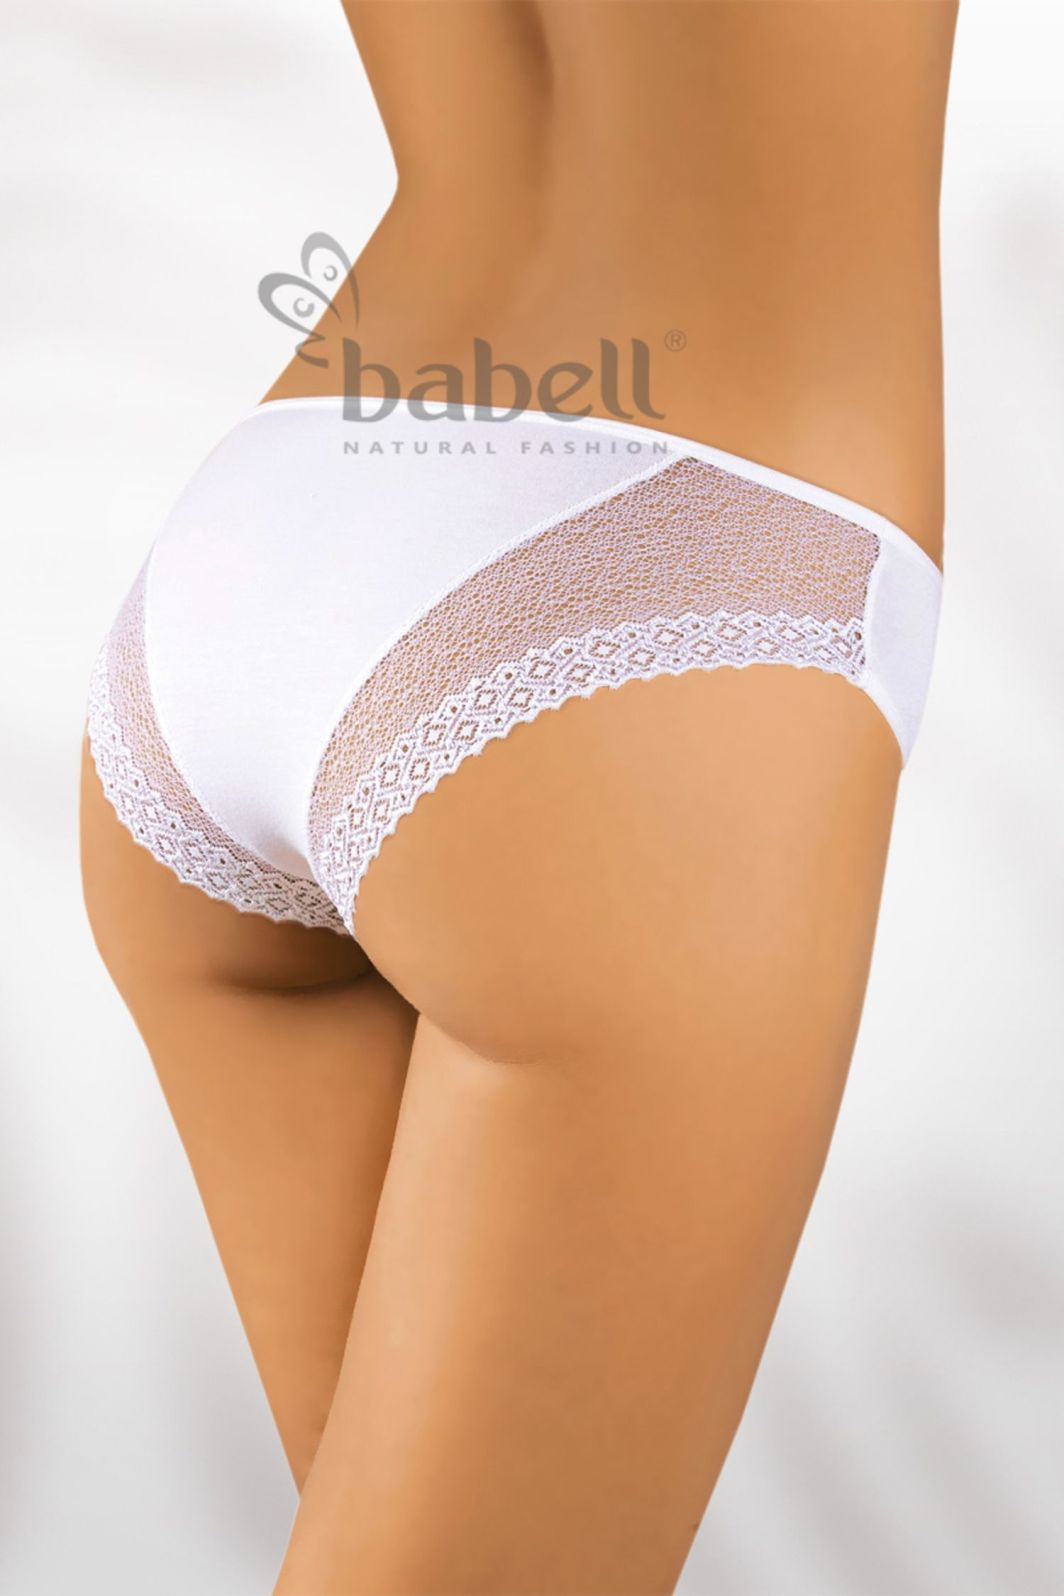 Babell Figi damskie BBL-012 białe r. XL 1